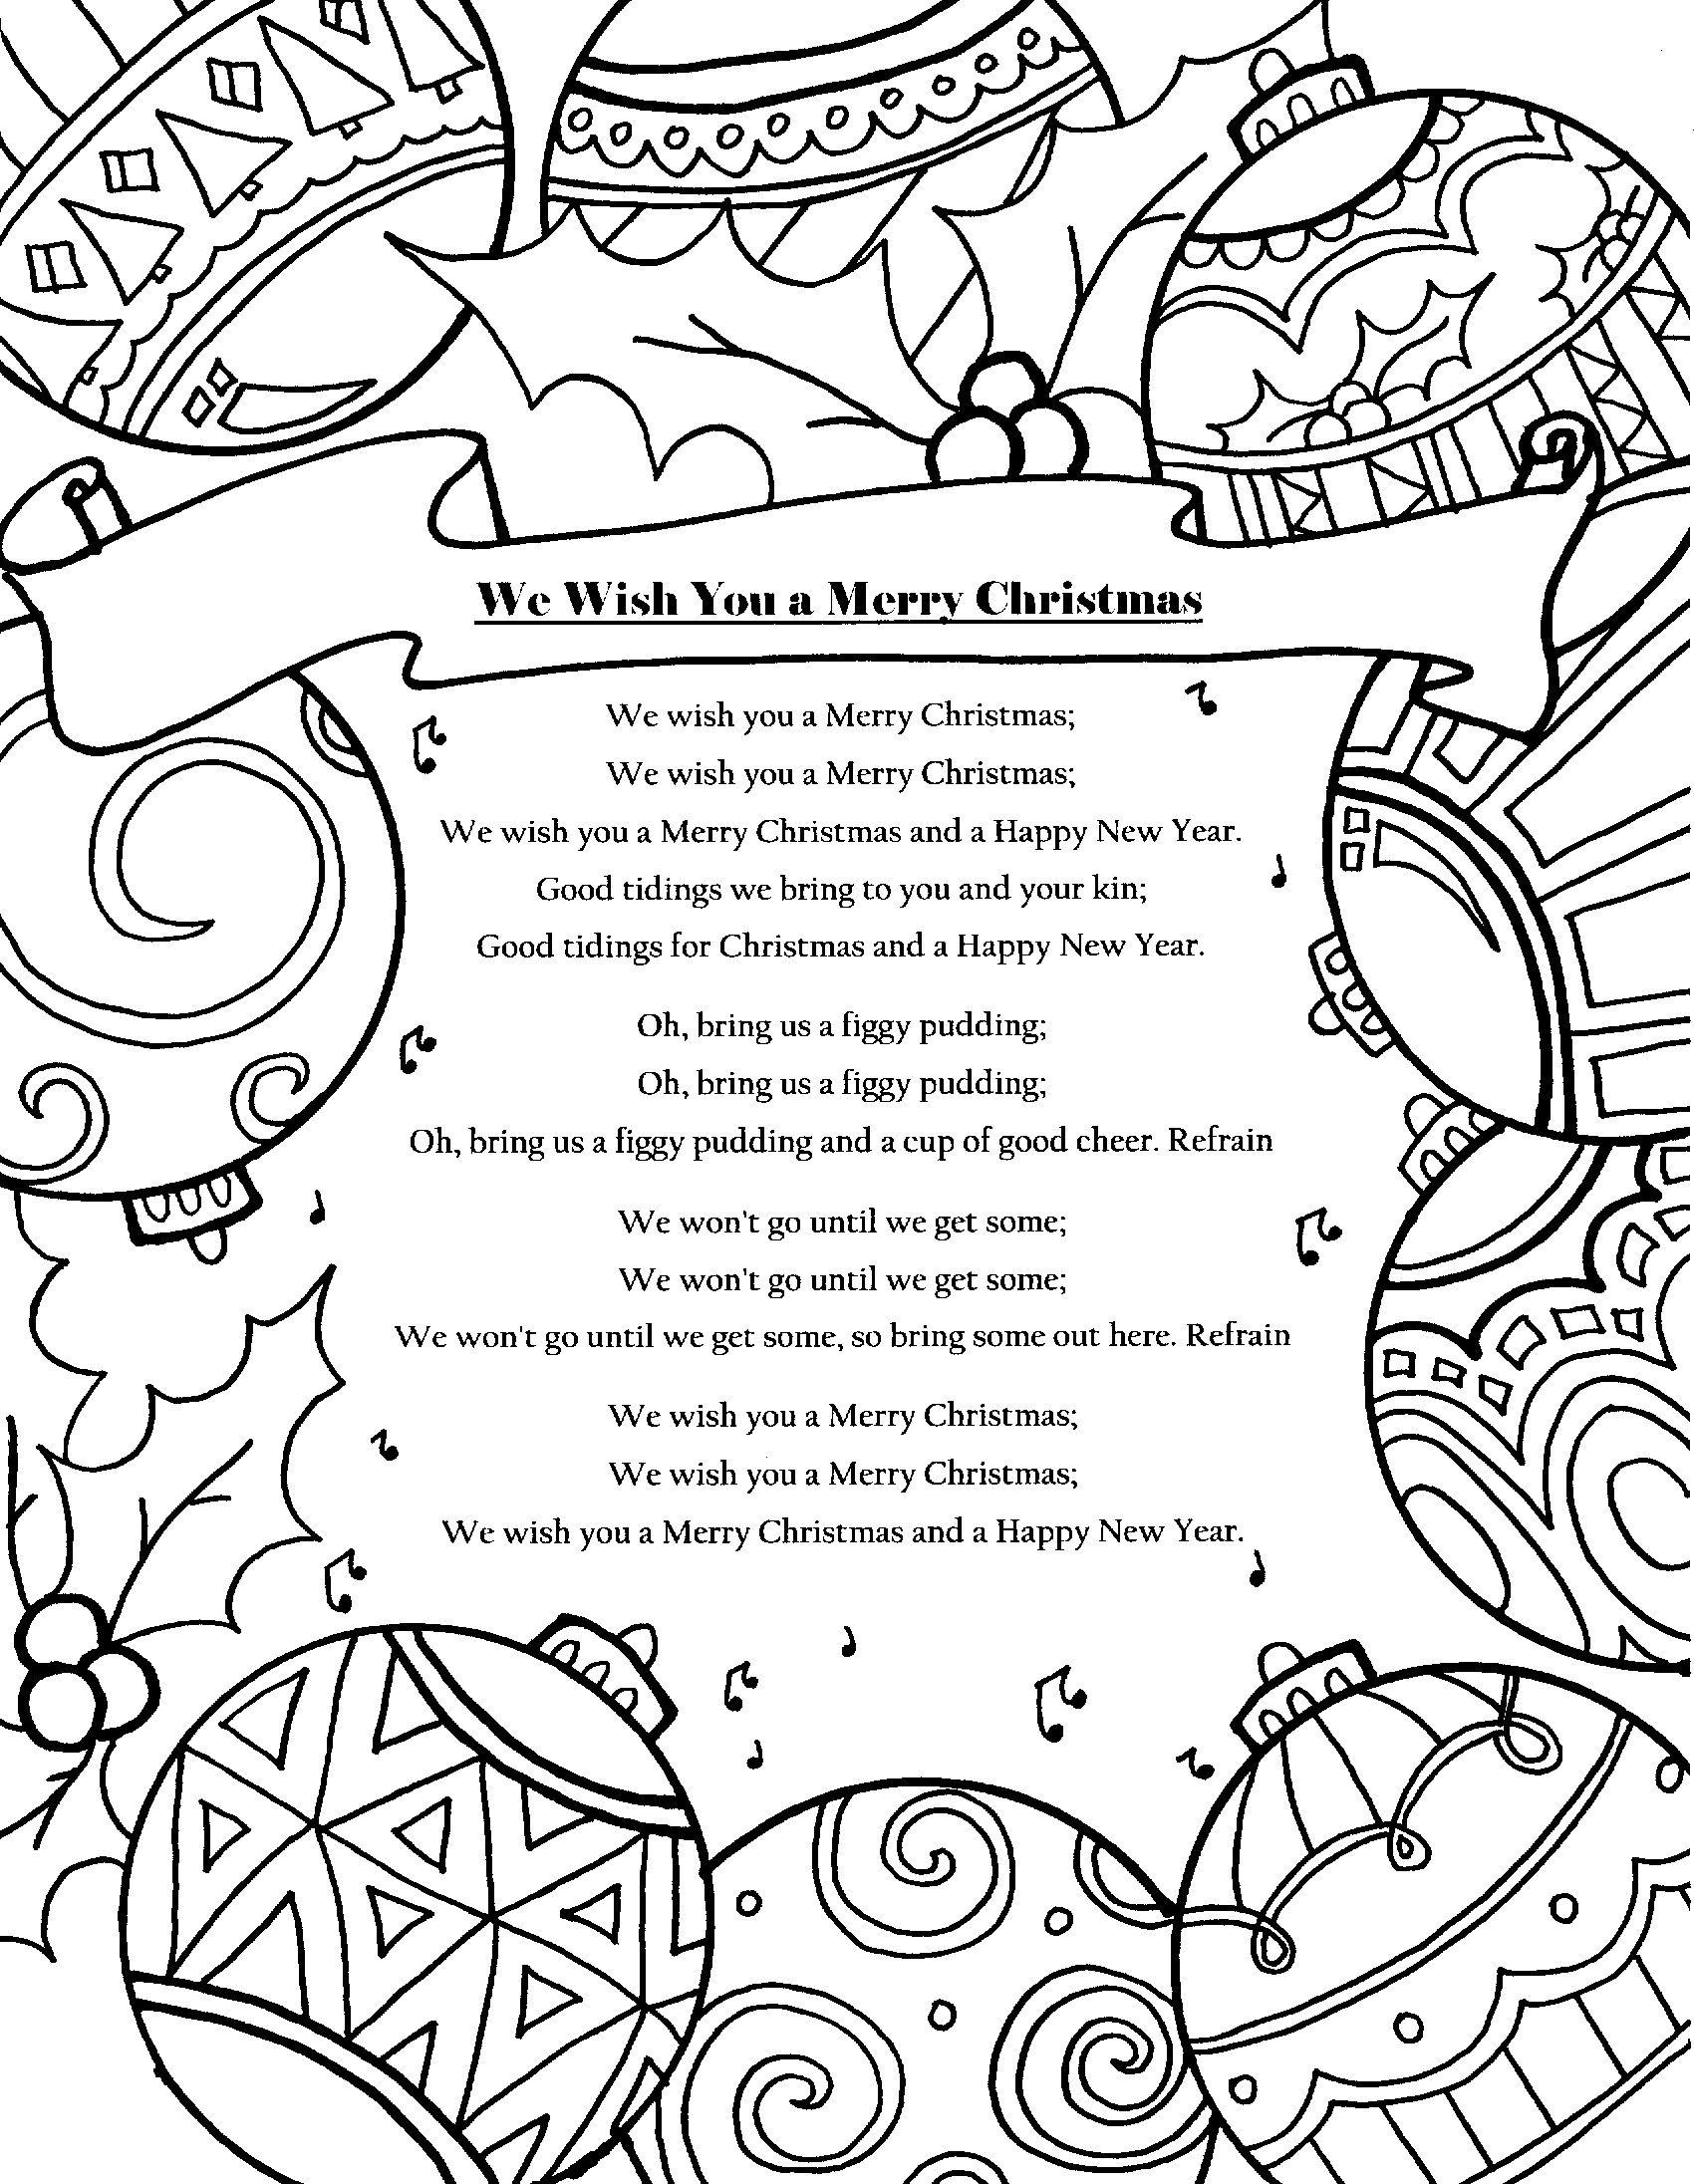 Christmas Carol Coloring Page etsy christmas coloring